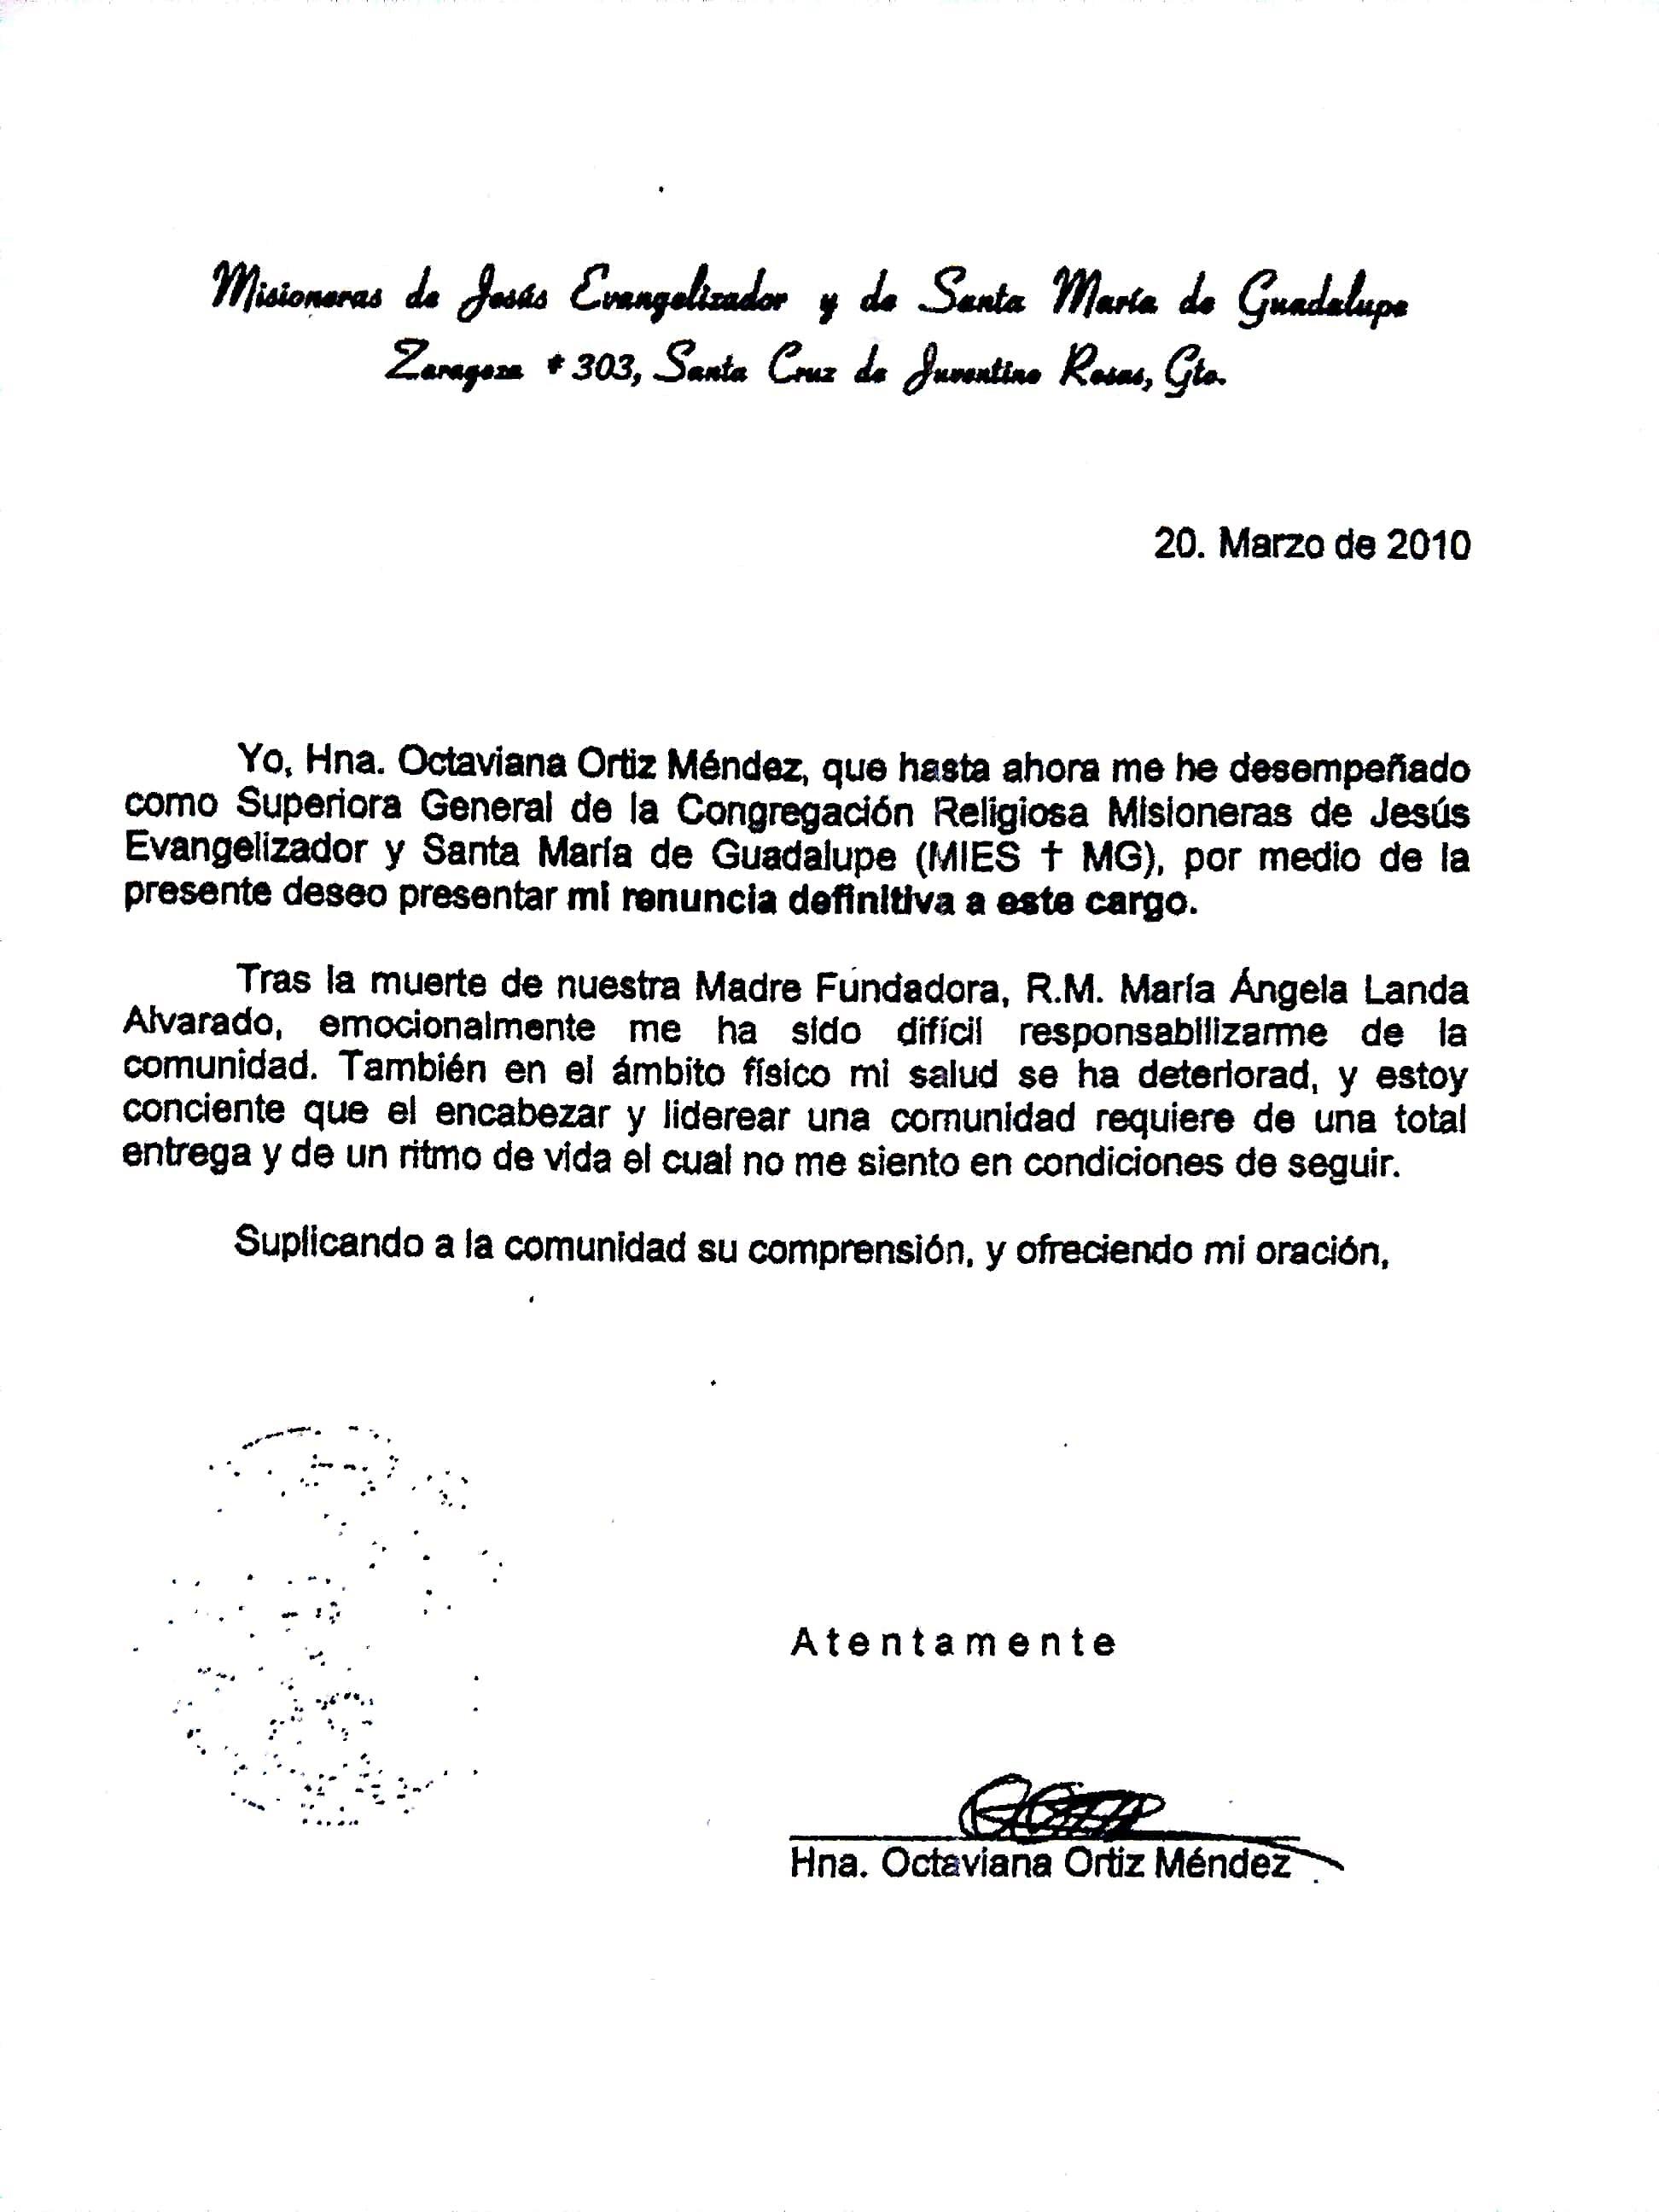 carta octaviana